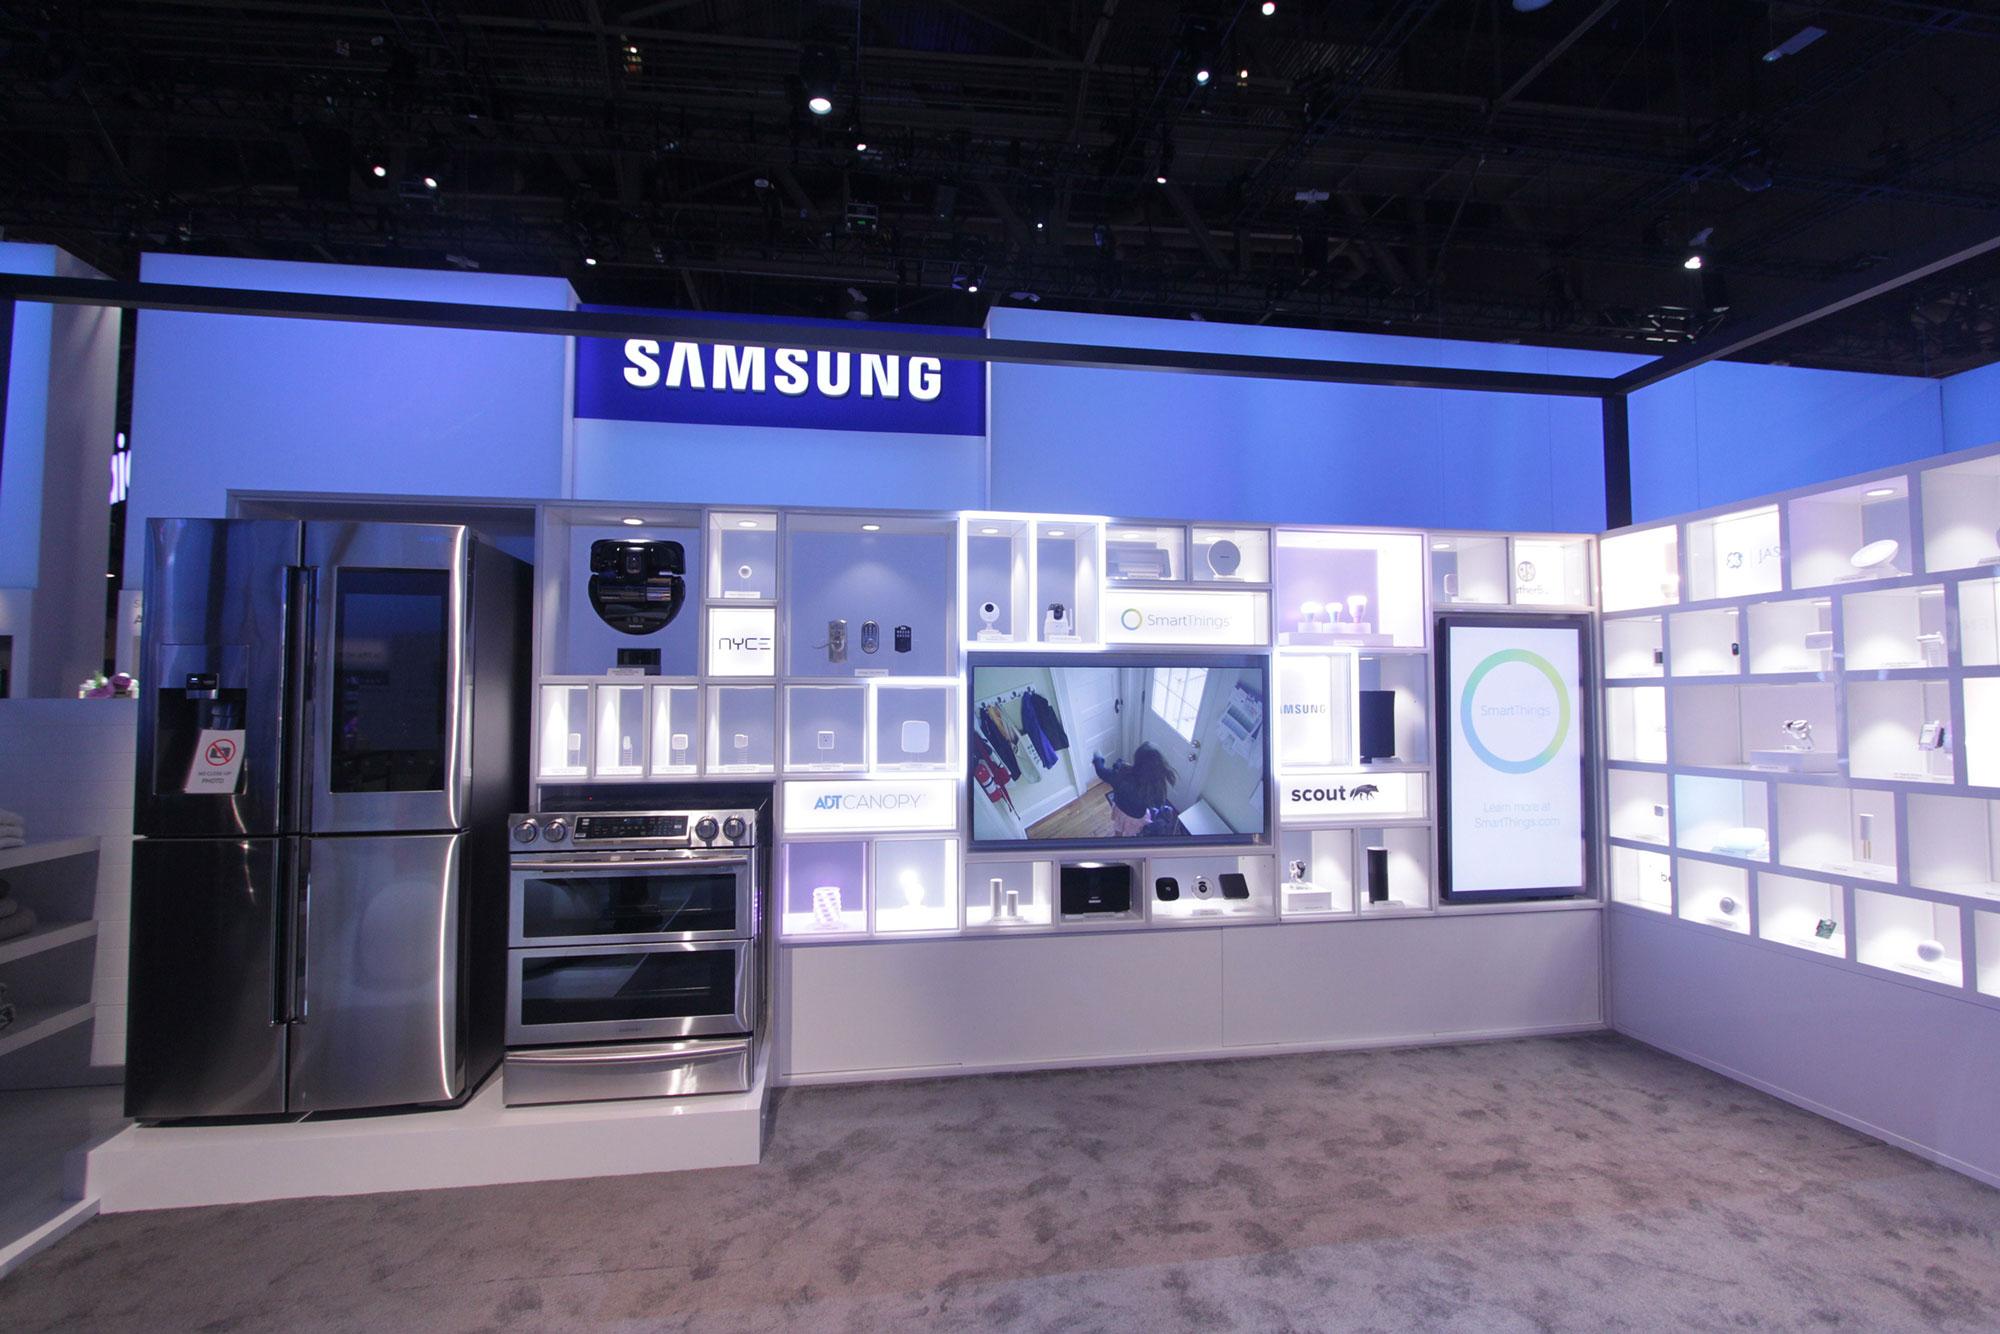 Samsung Exhibition Booth Design : Samsung ces exhibit lighting fine design associates